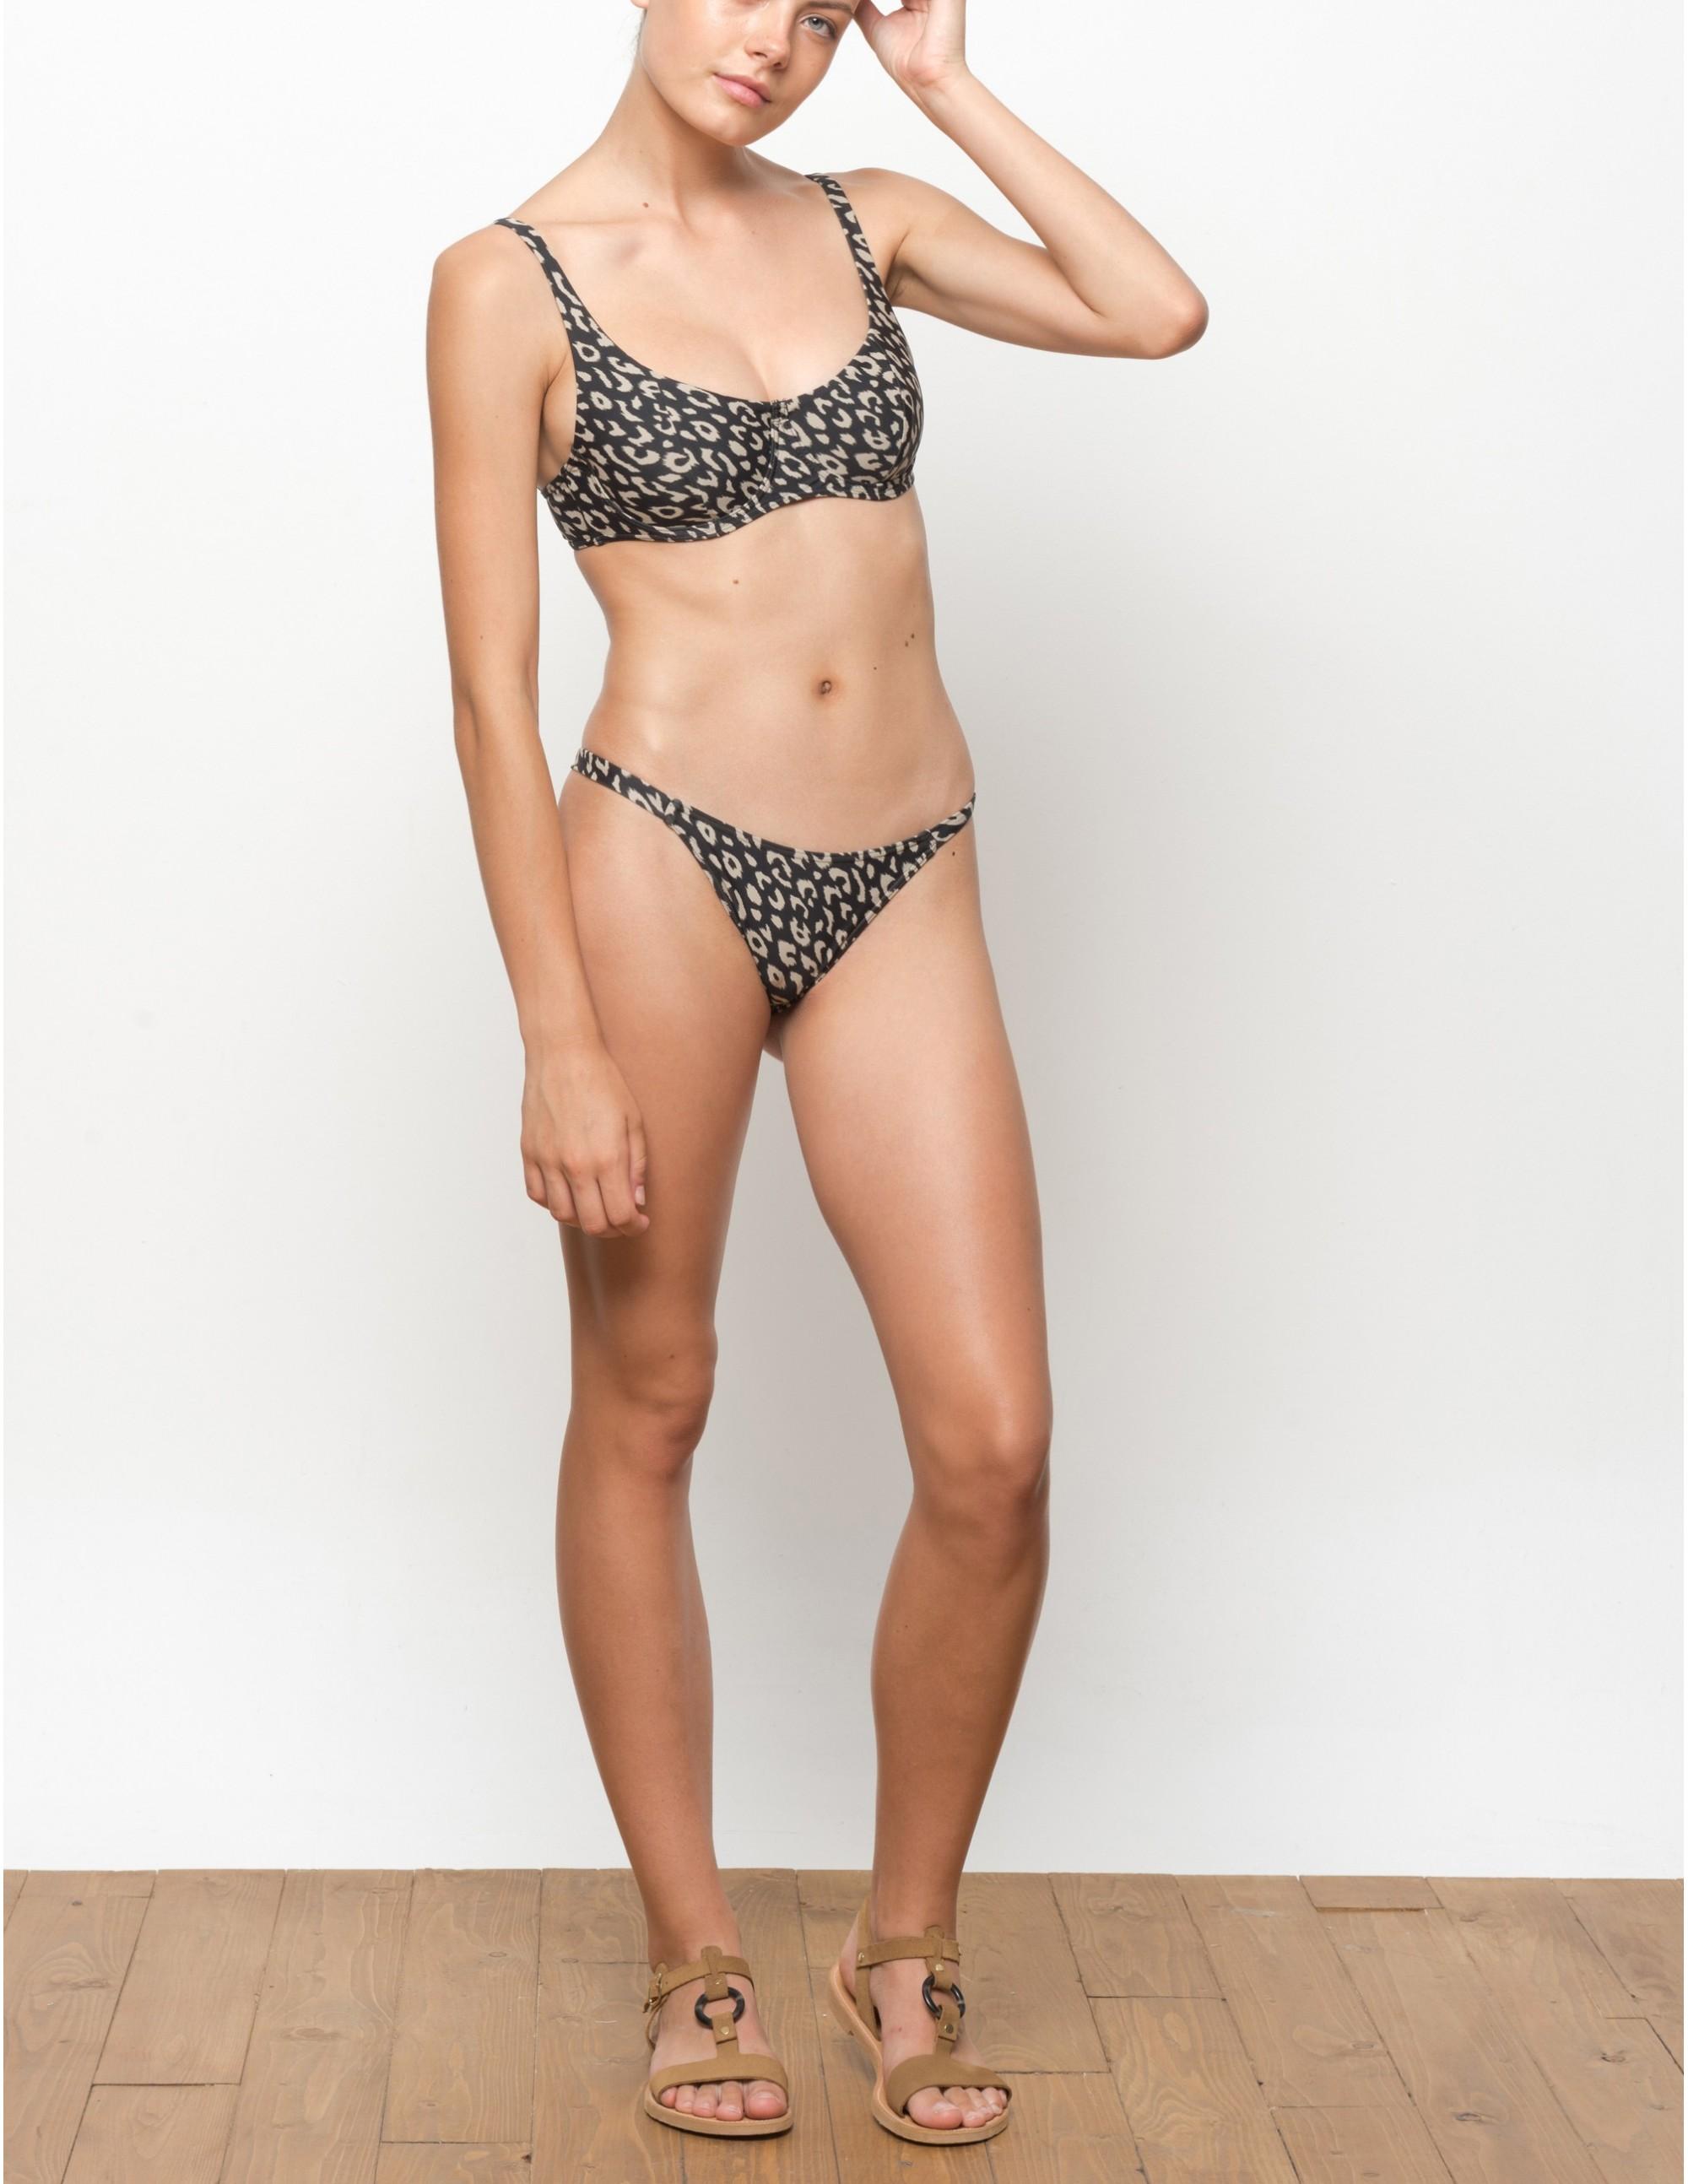 KIGO bikini bottom - LEOPARD